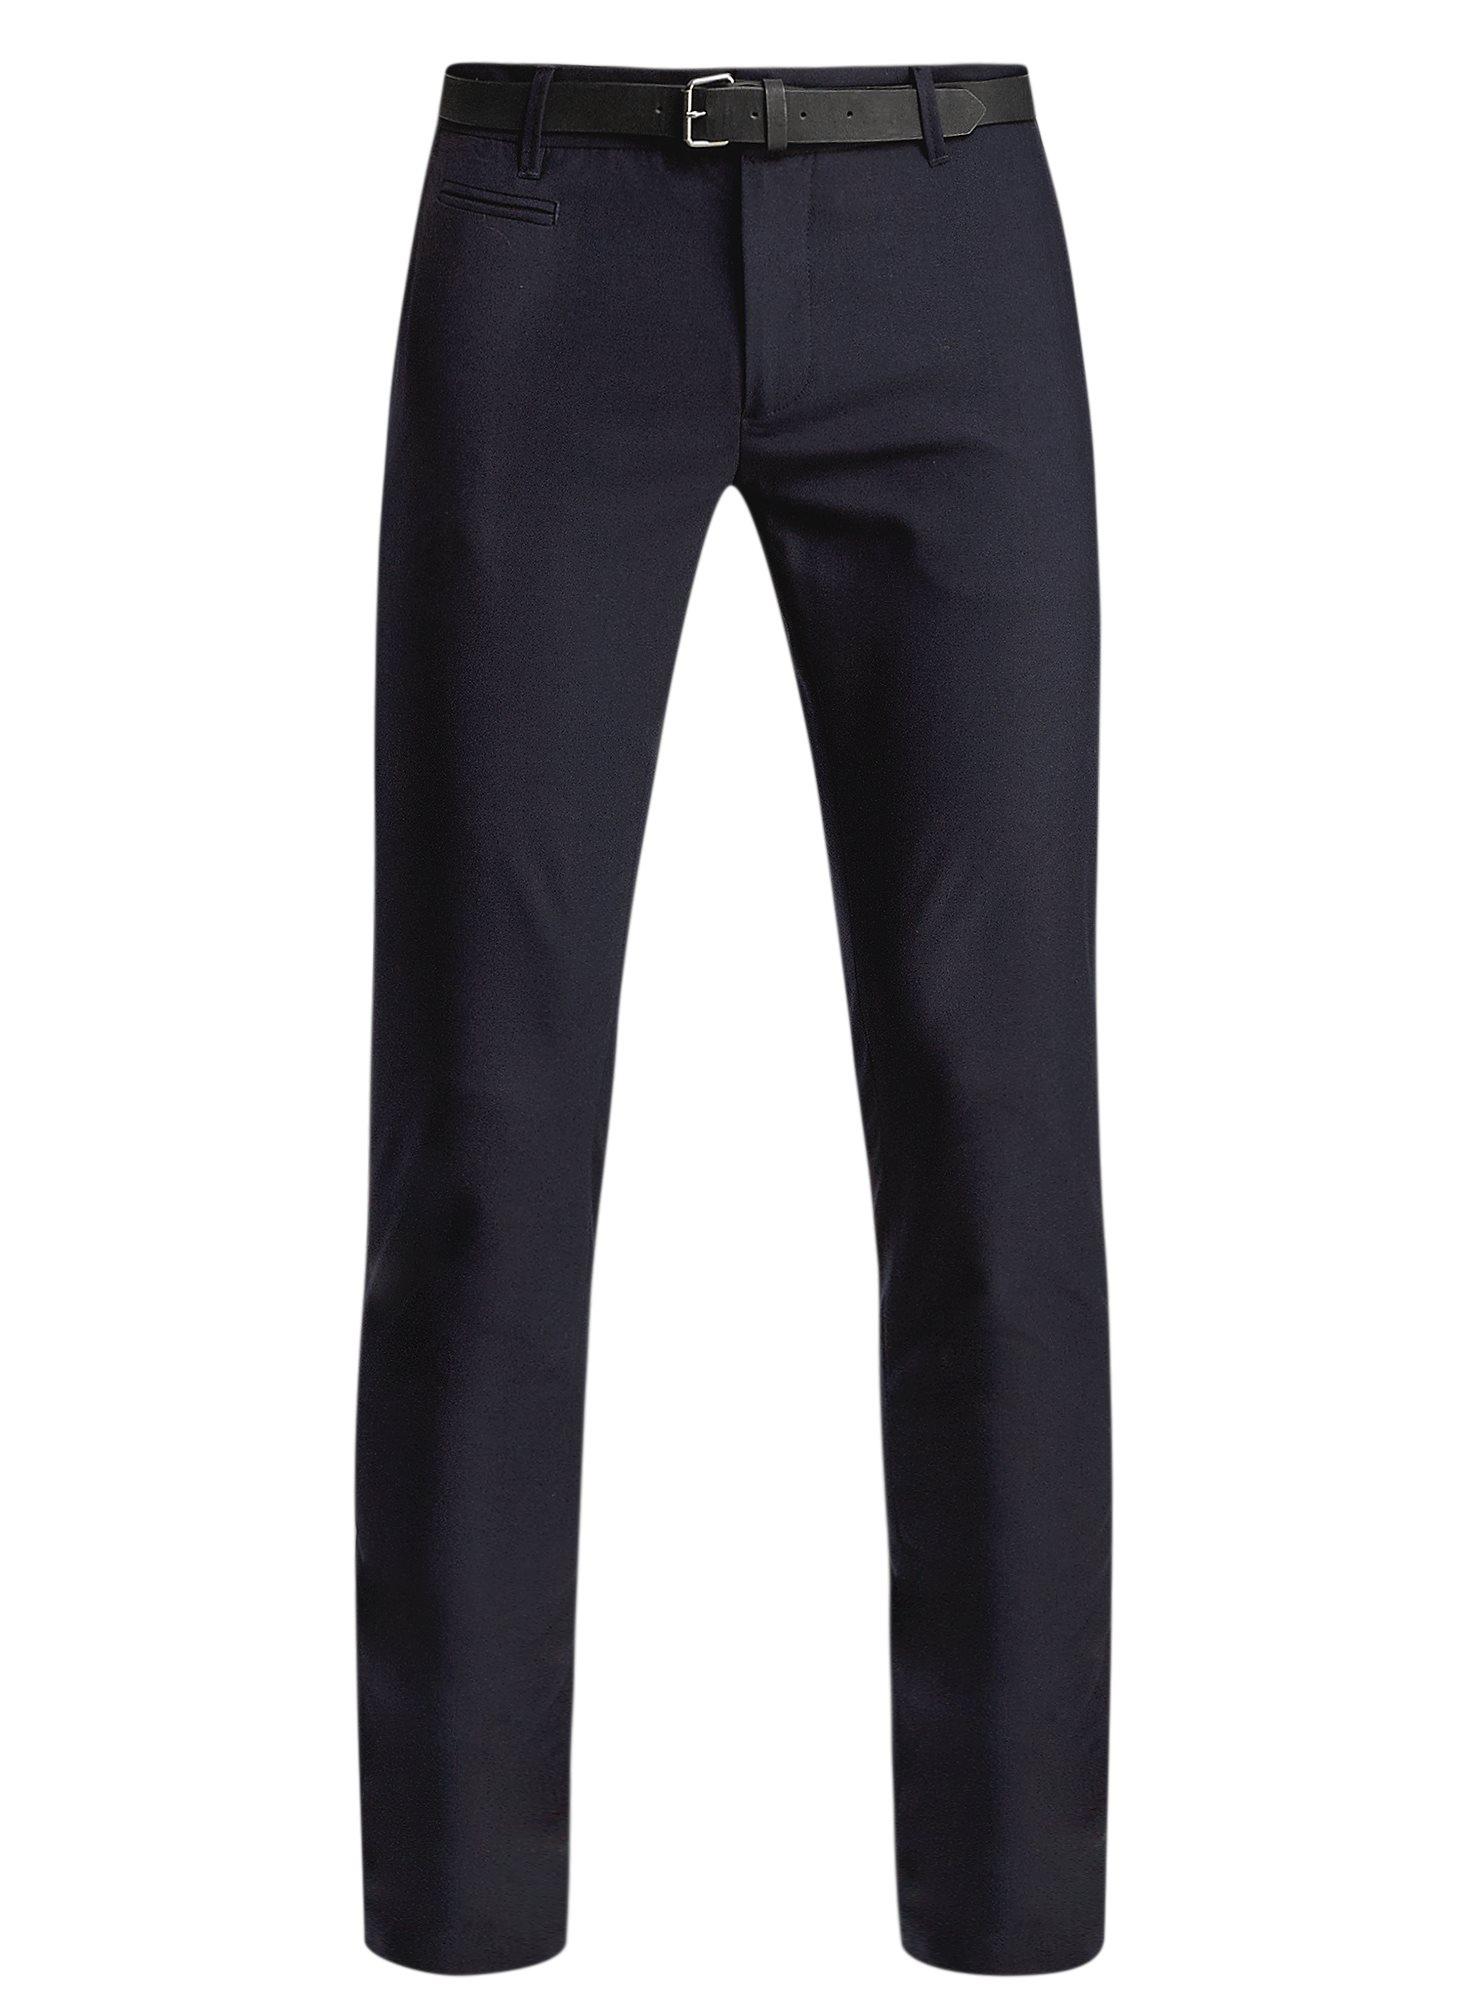 Брюки классические slim fit oodji для мужчины (синий), 2L210166M/44320N/7900O